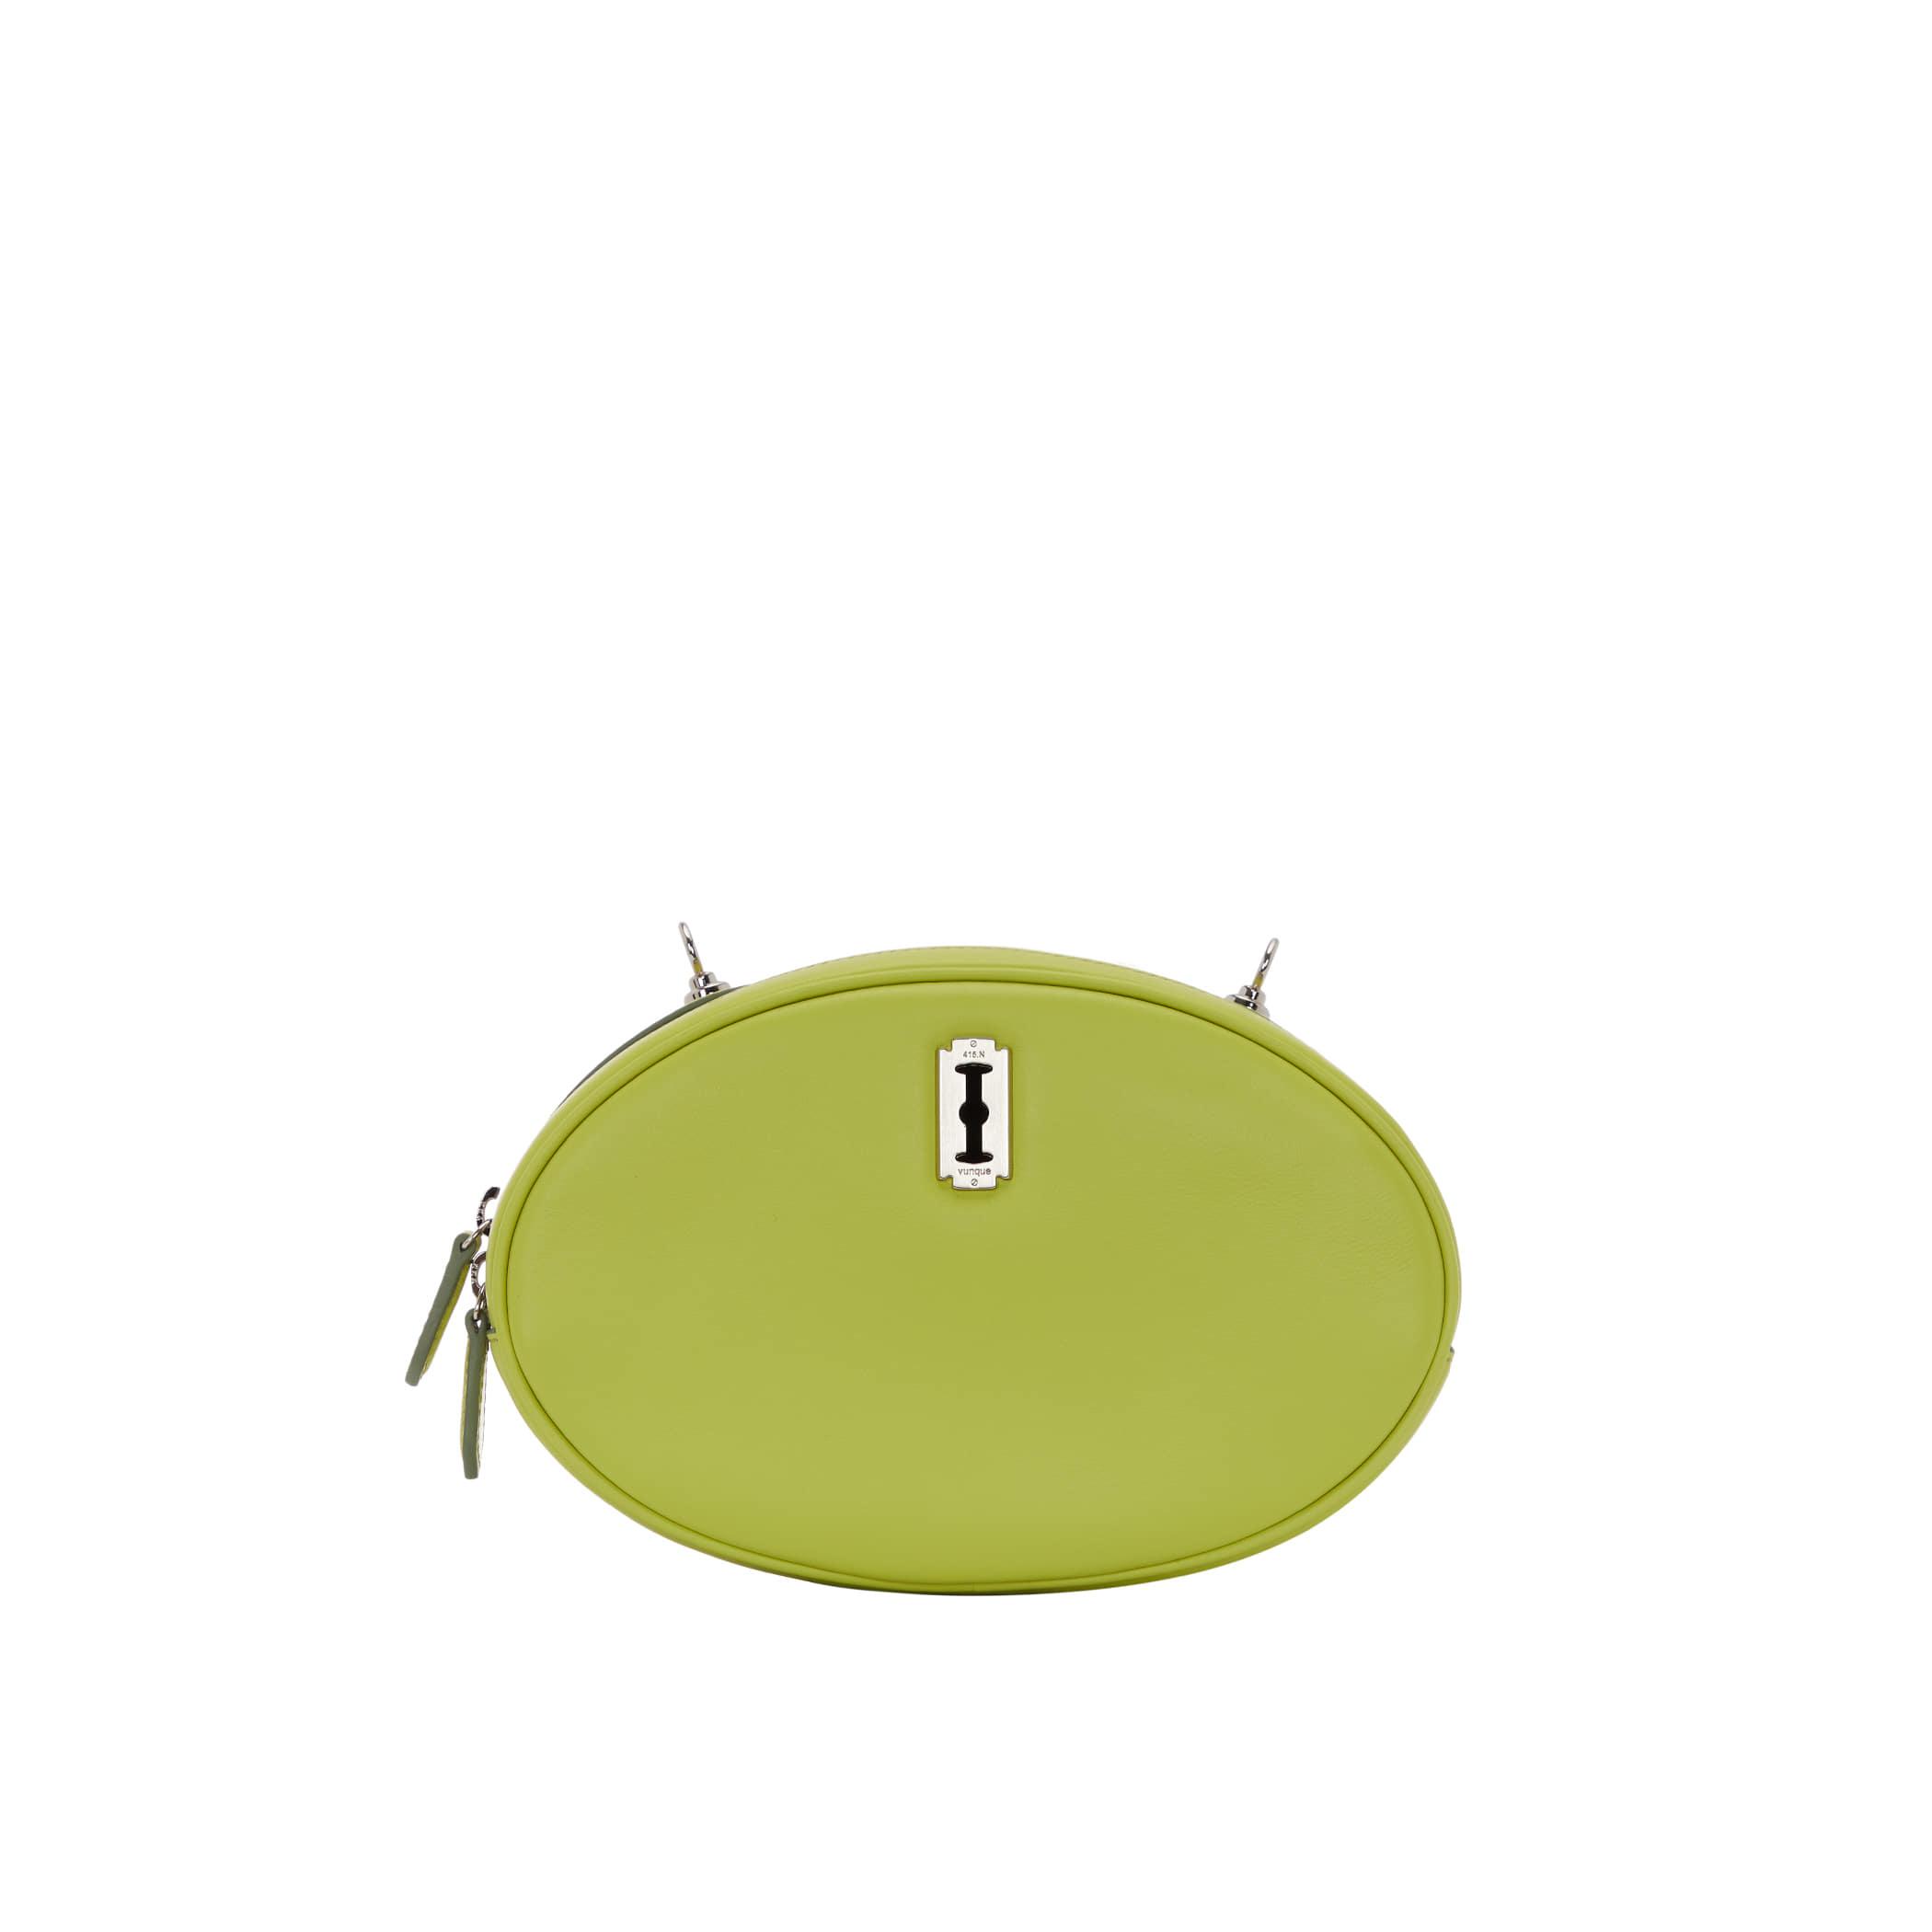 Mercury Round Shoulder (머큐리 라운드 숄더) Lemon Green